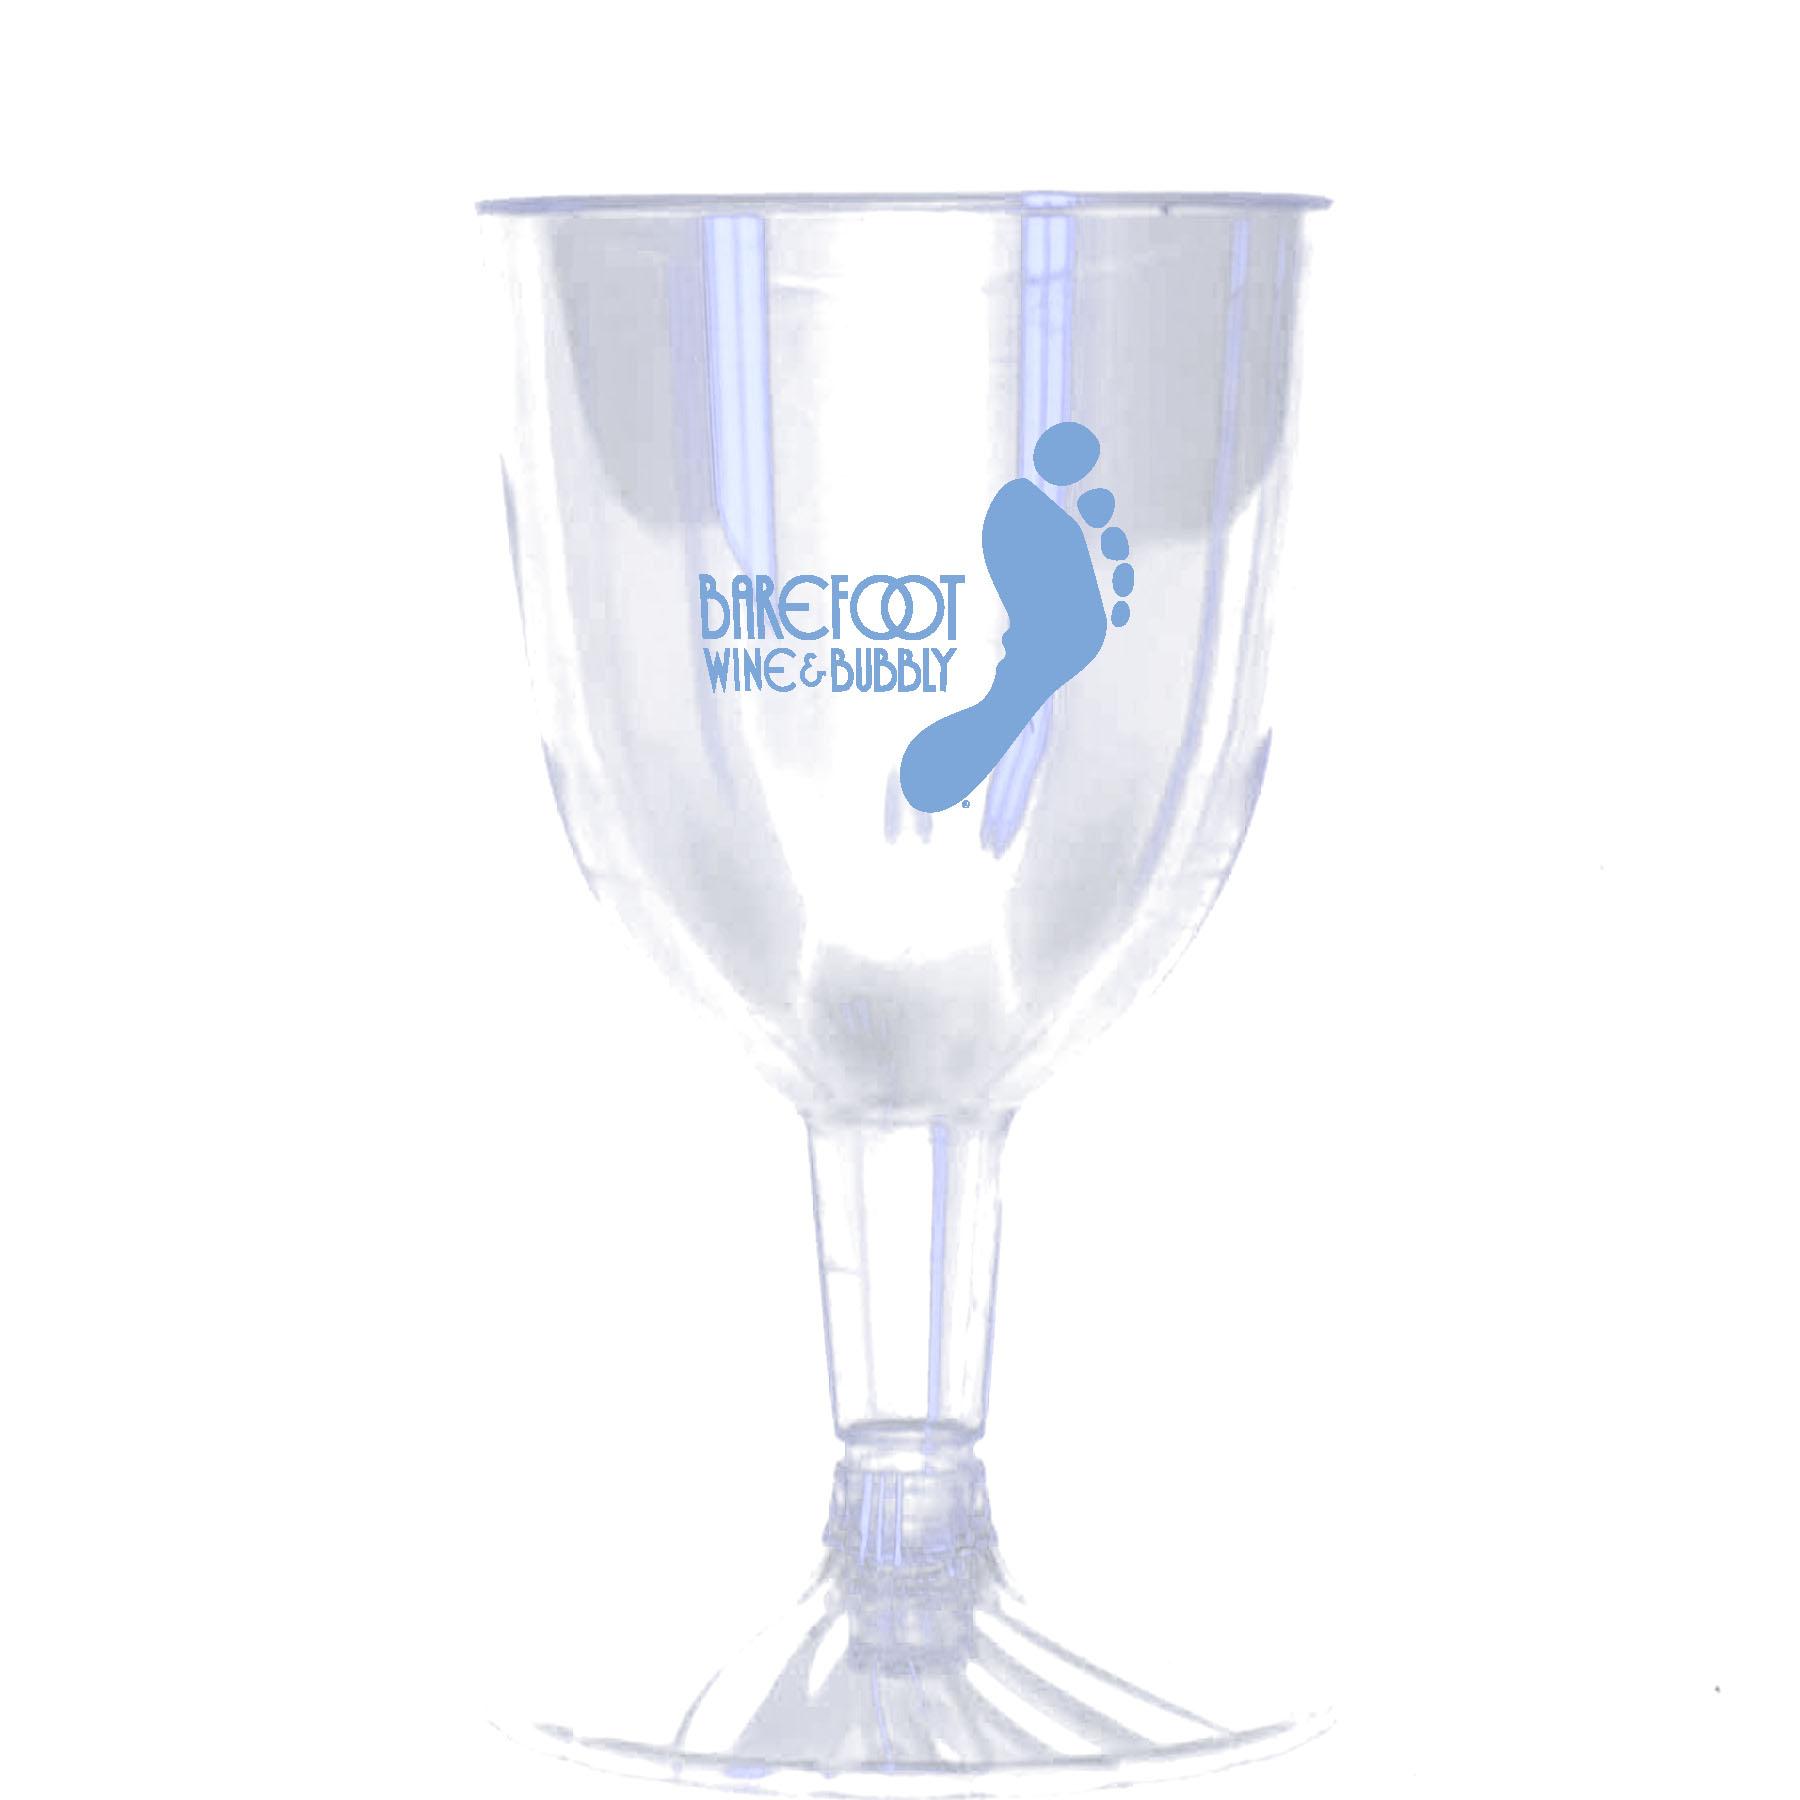 5 Oz. 2-Piece Wine Glass - Specialty Cups - The 500 Line